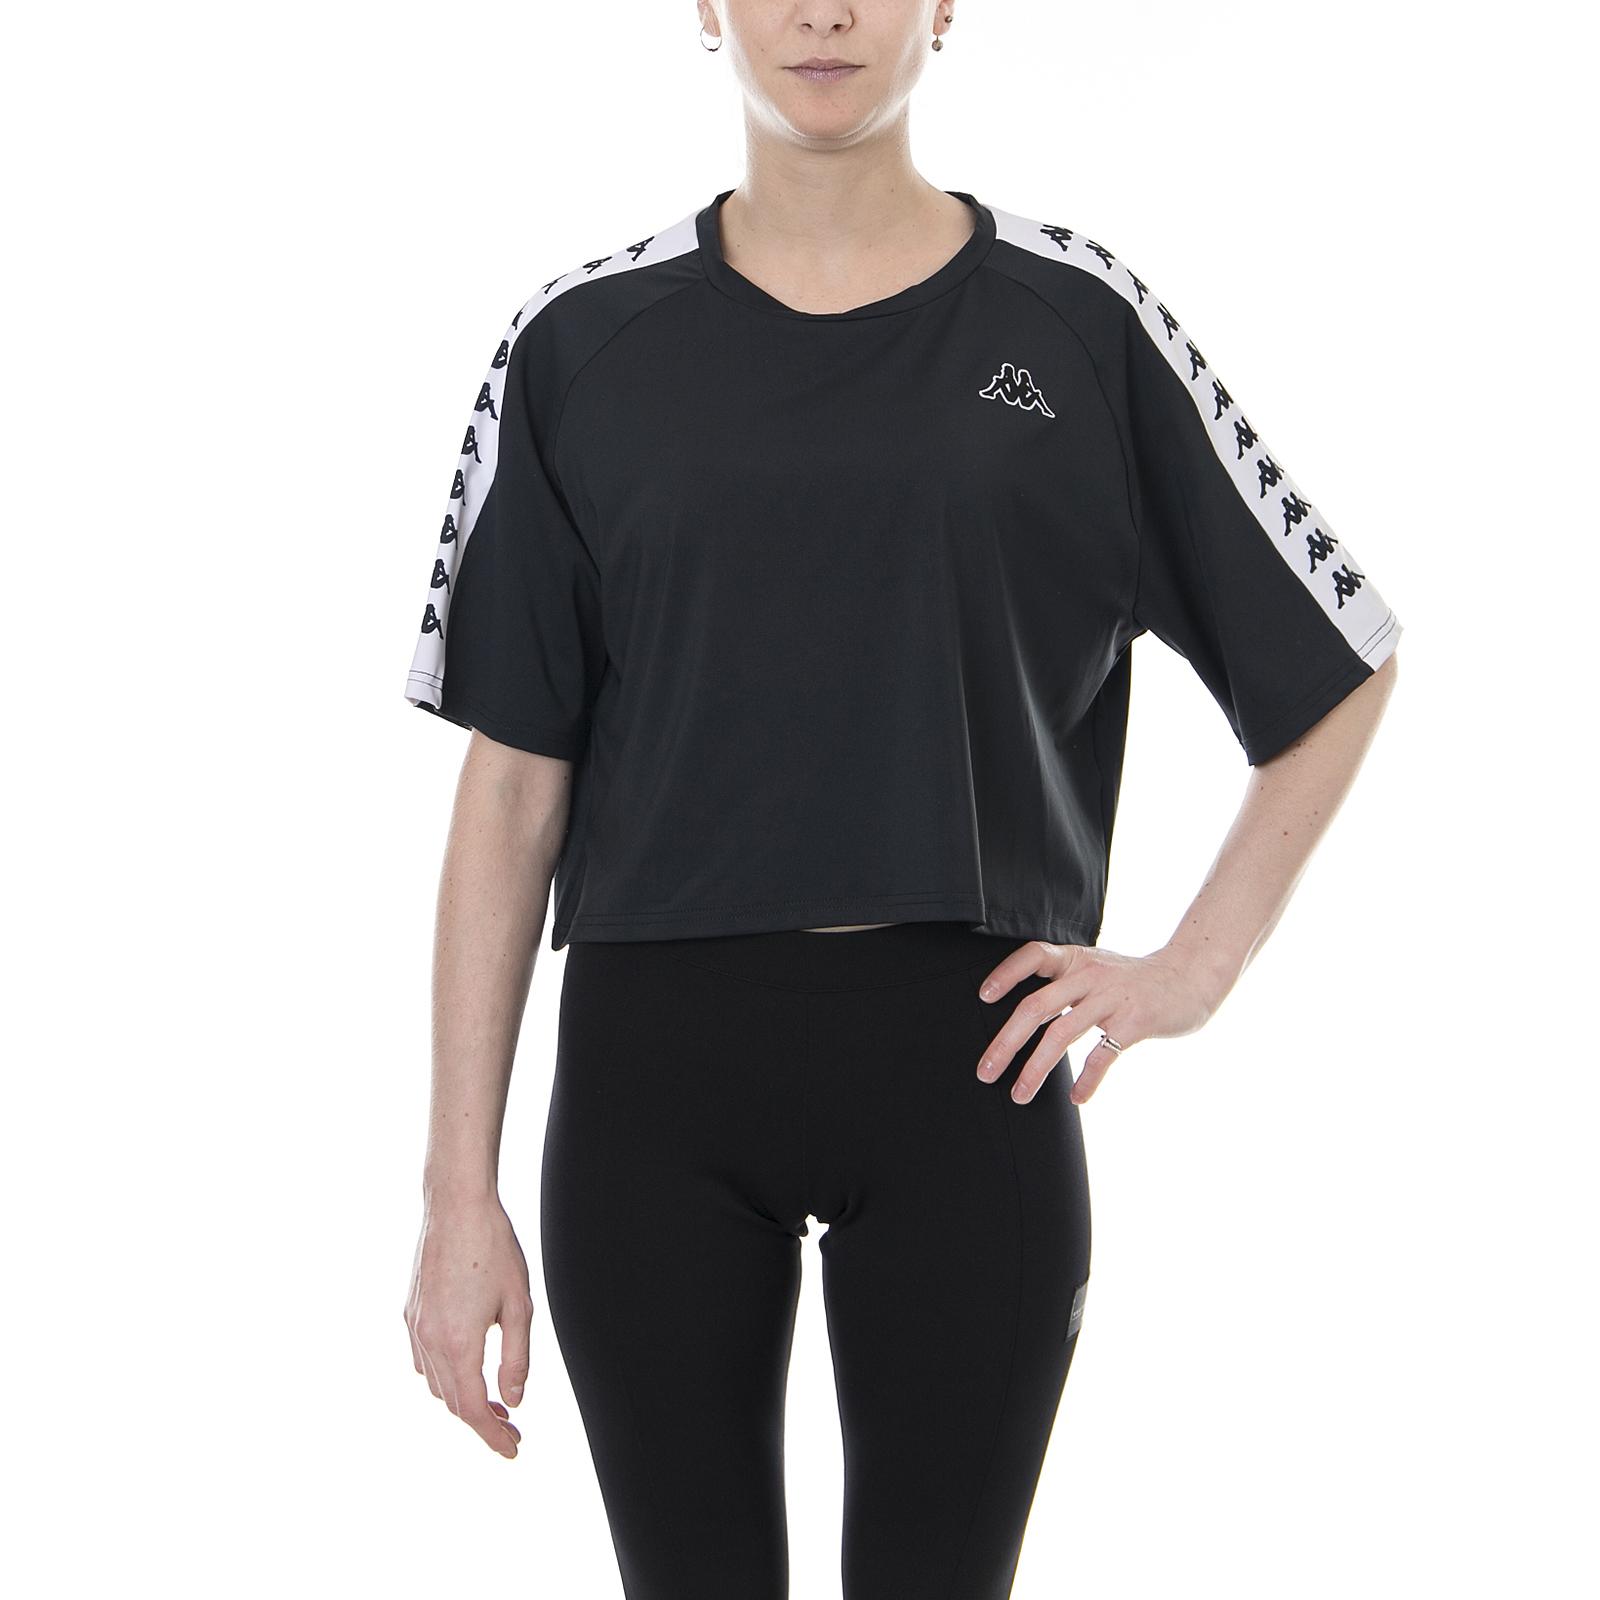 Kappa T-Shirt 222 Banda Atum Black-White Nero